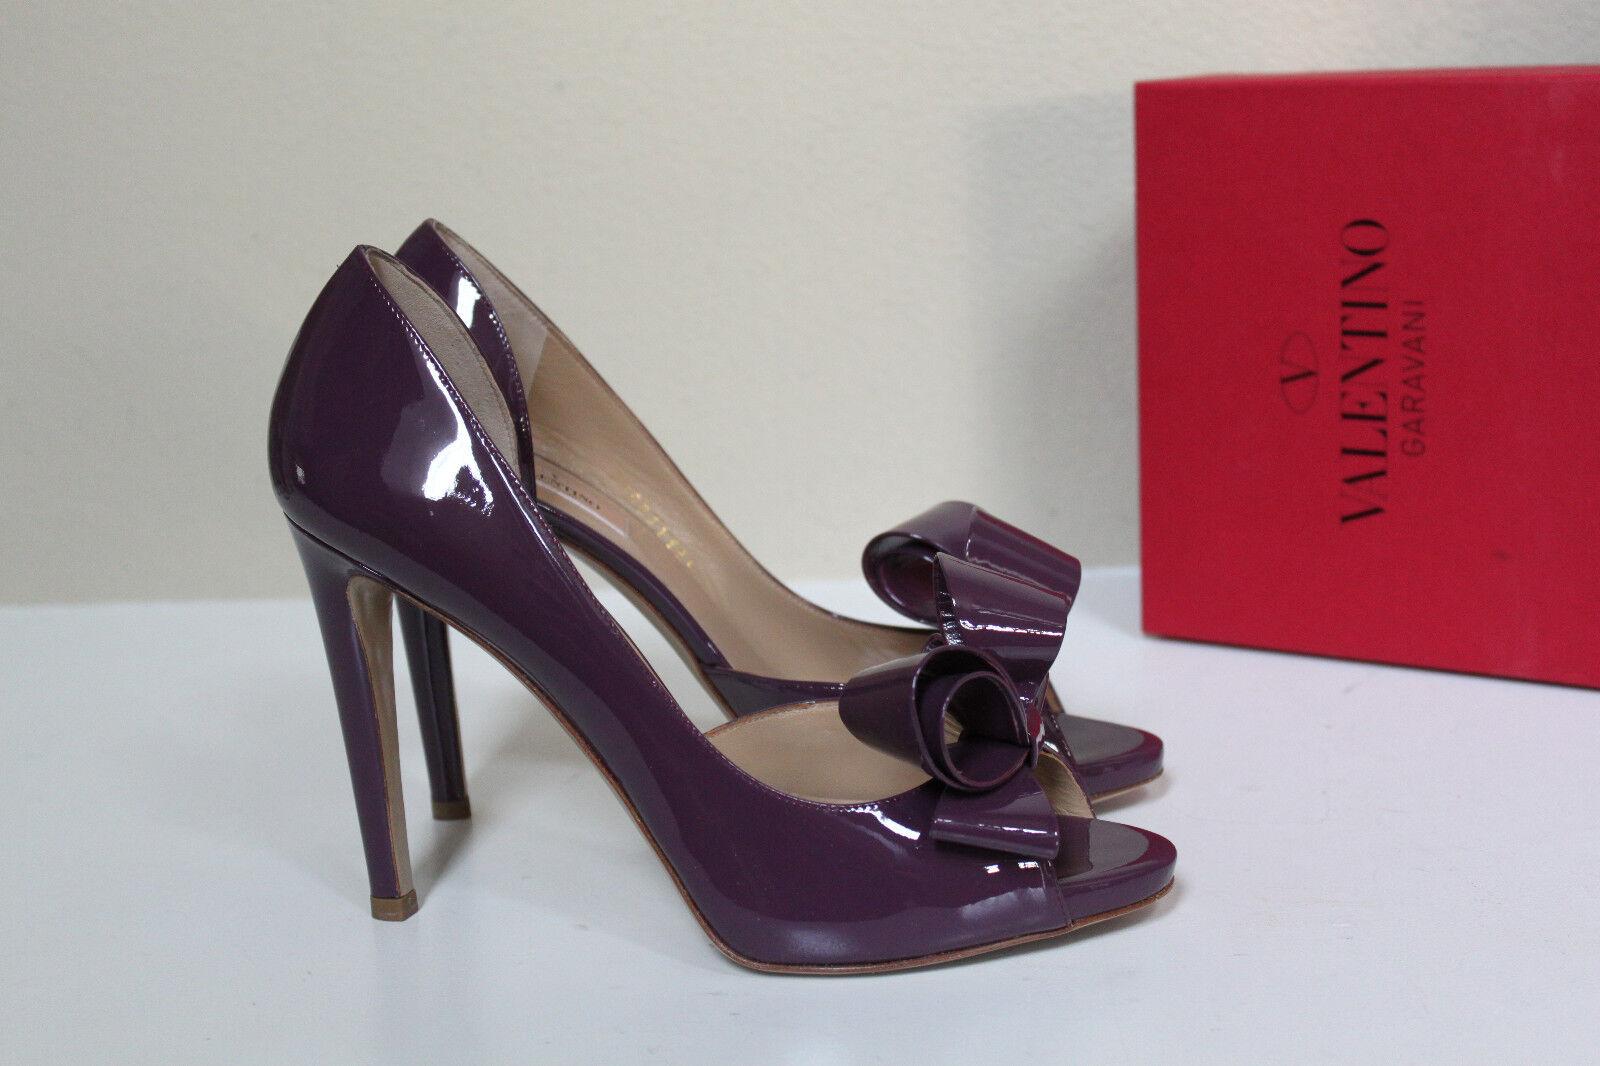 in vendita 10.5 40.5 40.5 40.5 Valentino Couture Bow d'Orsay viola Patent Leather Platform Pump Shoe  fabbrica diretta